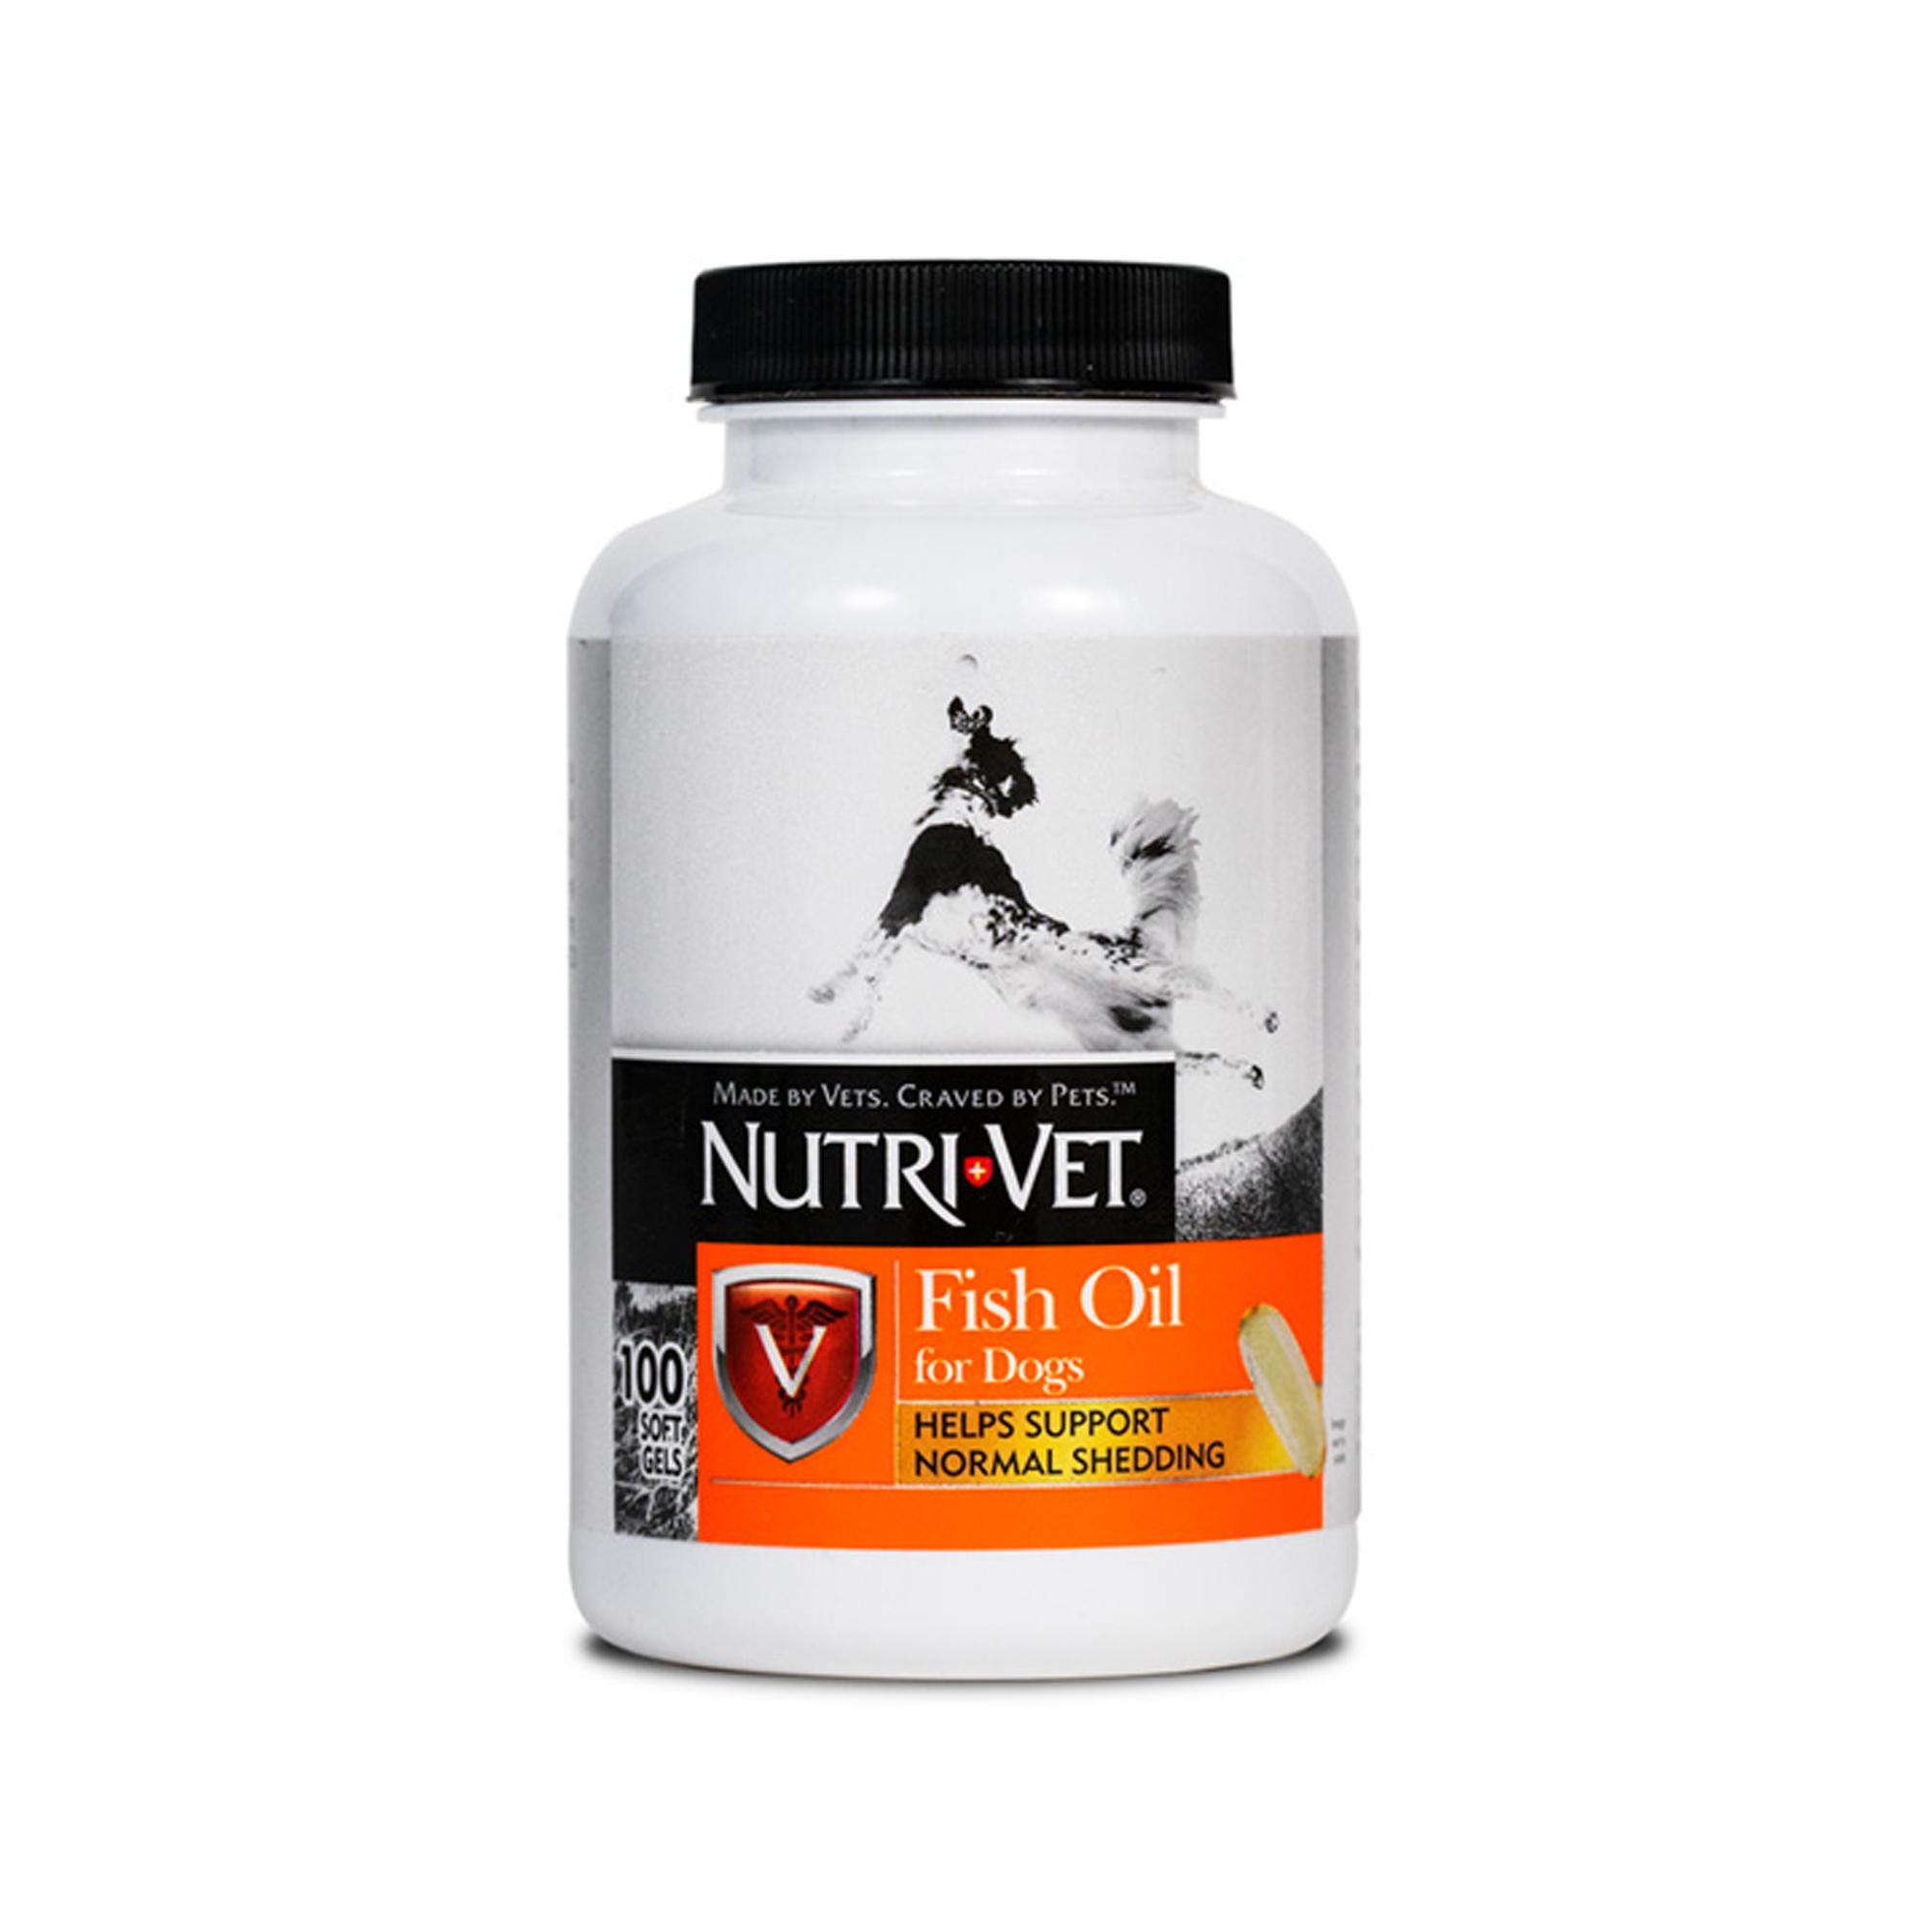 Nutri-Vet Fish Oil Softgels, 100 ct